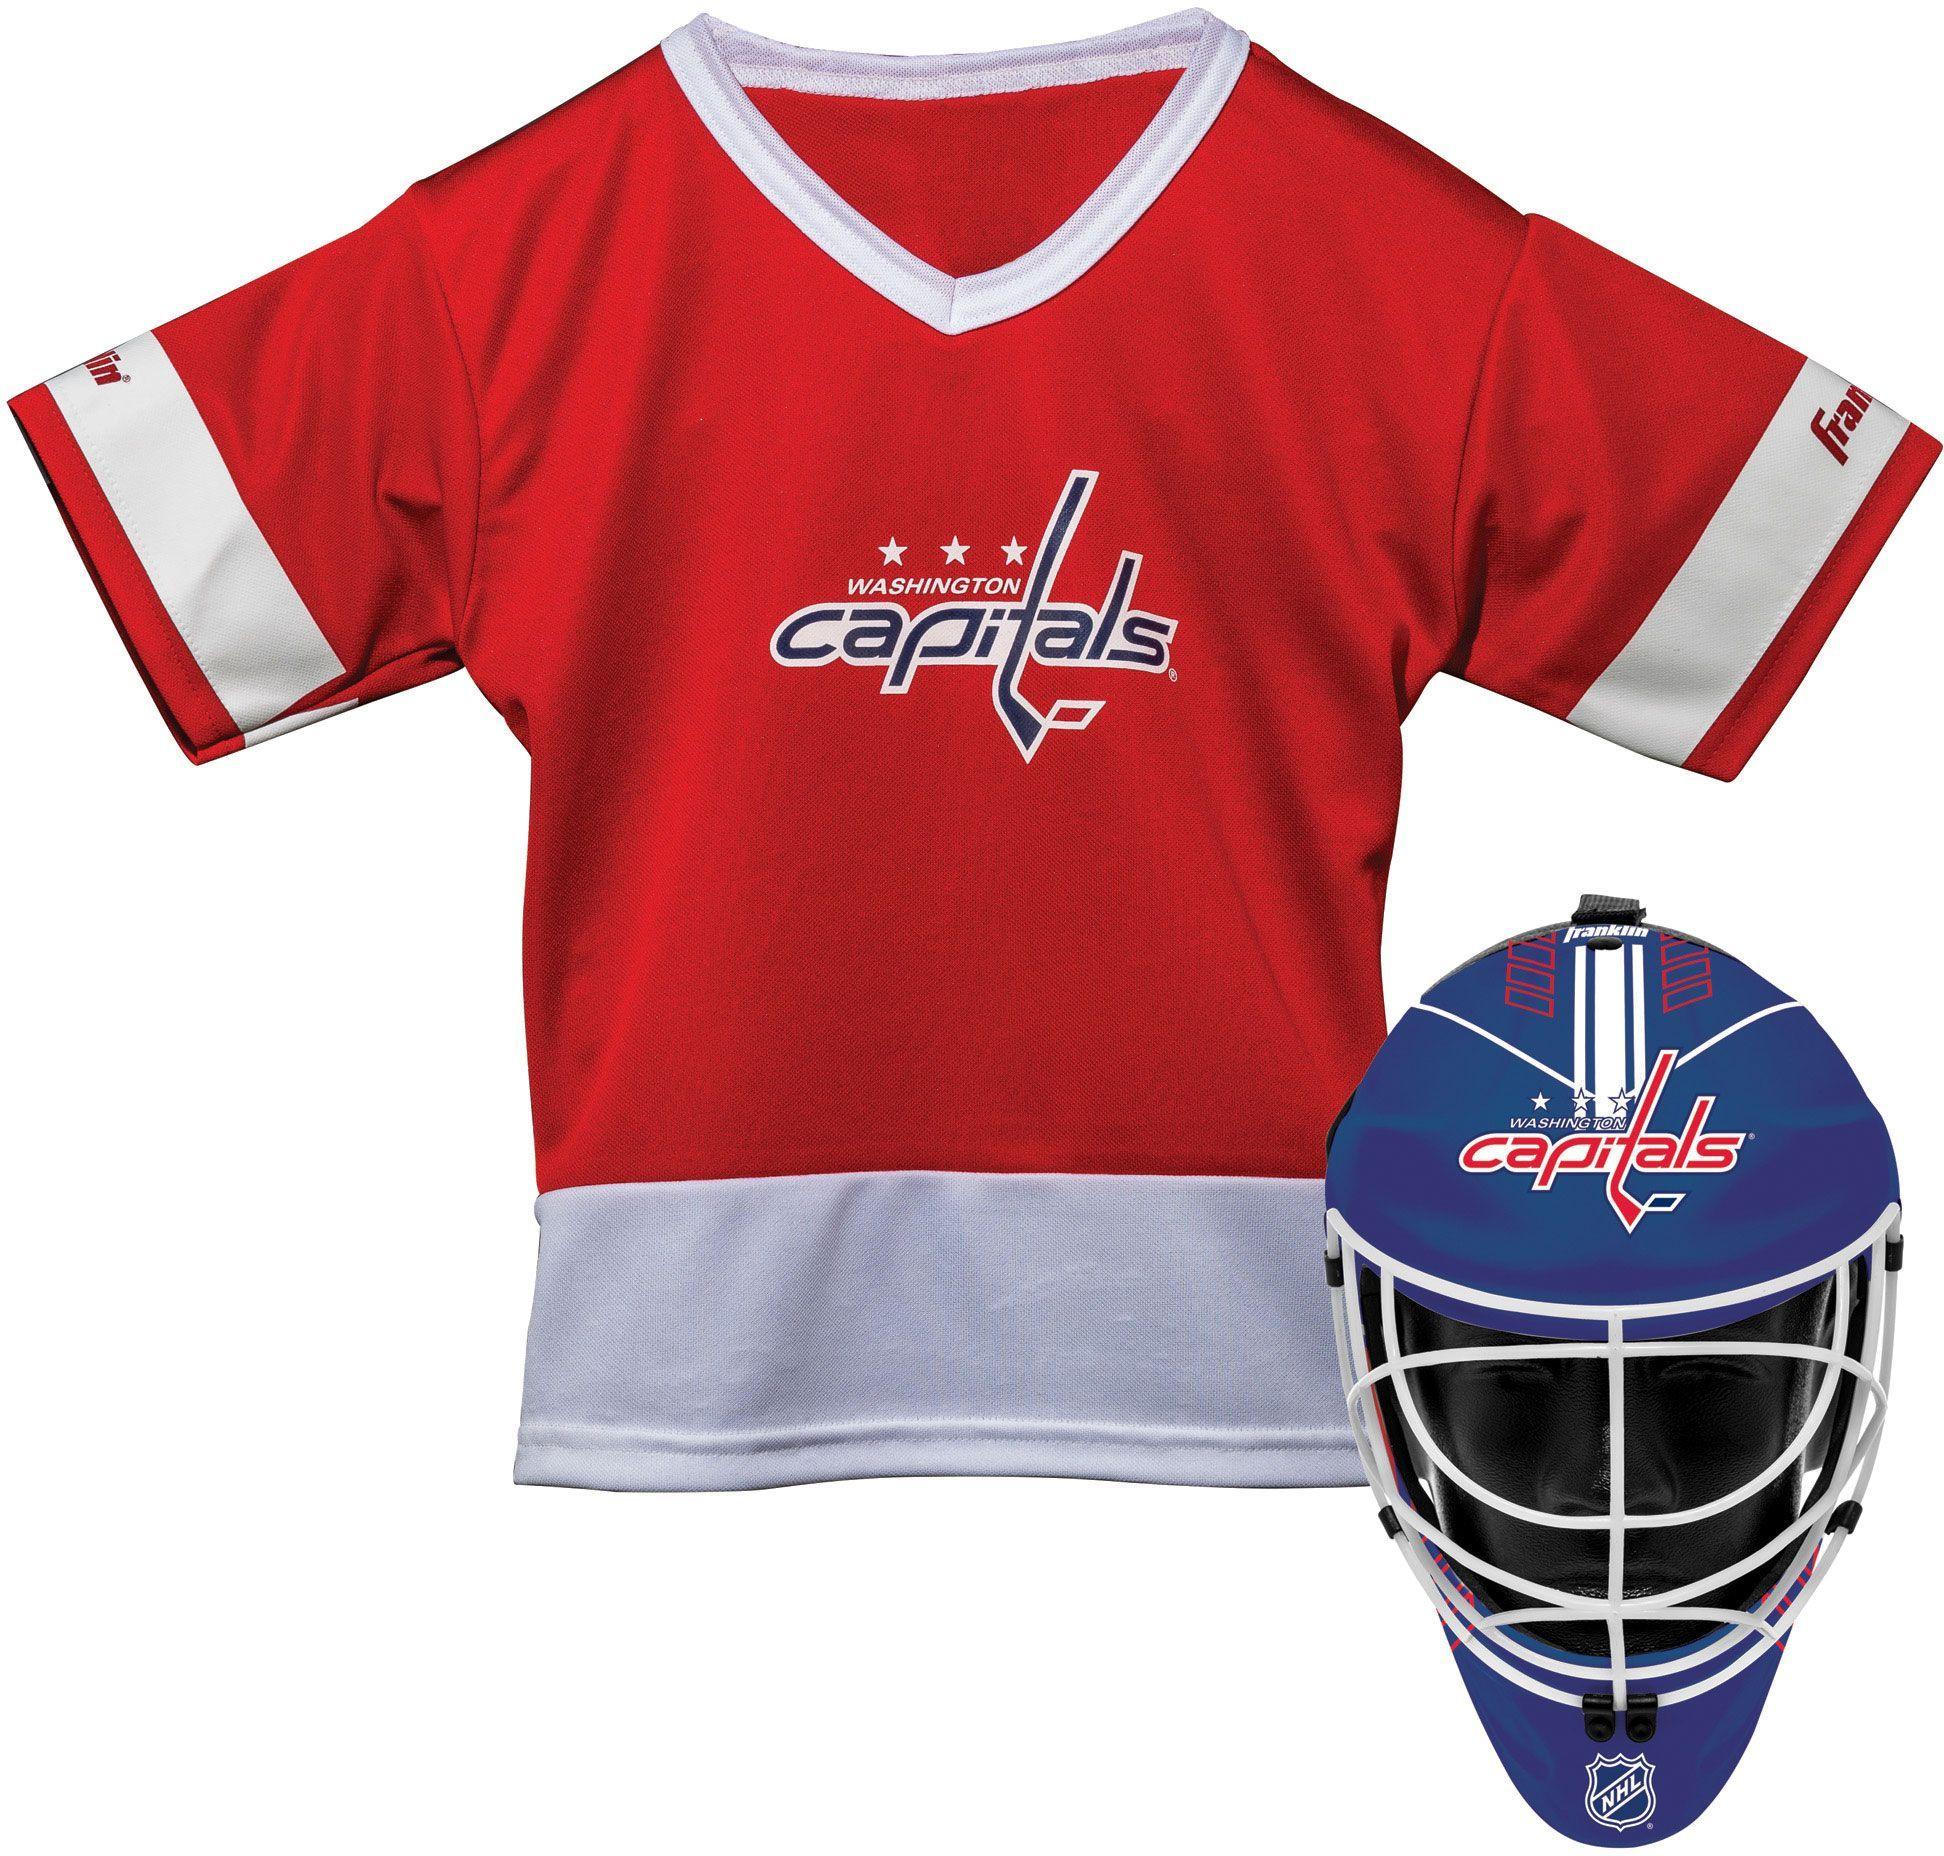 watch adba8 d936d Franklin Washington Capitals Kids' Goalie Costume Set, Kids ...